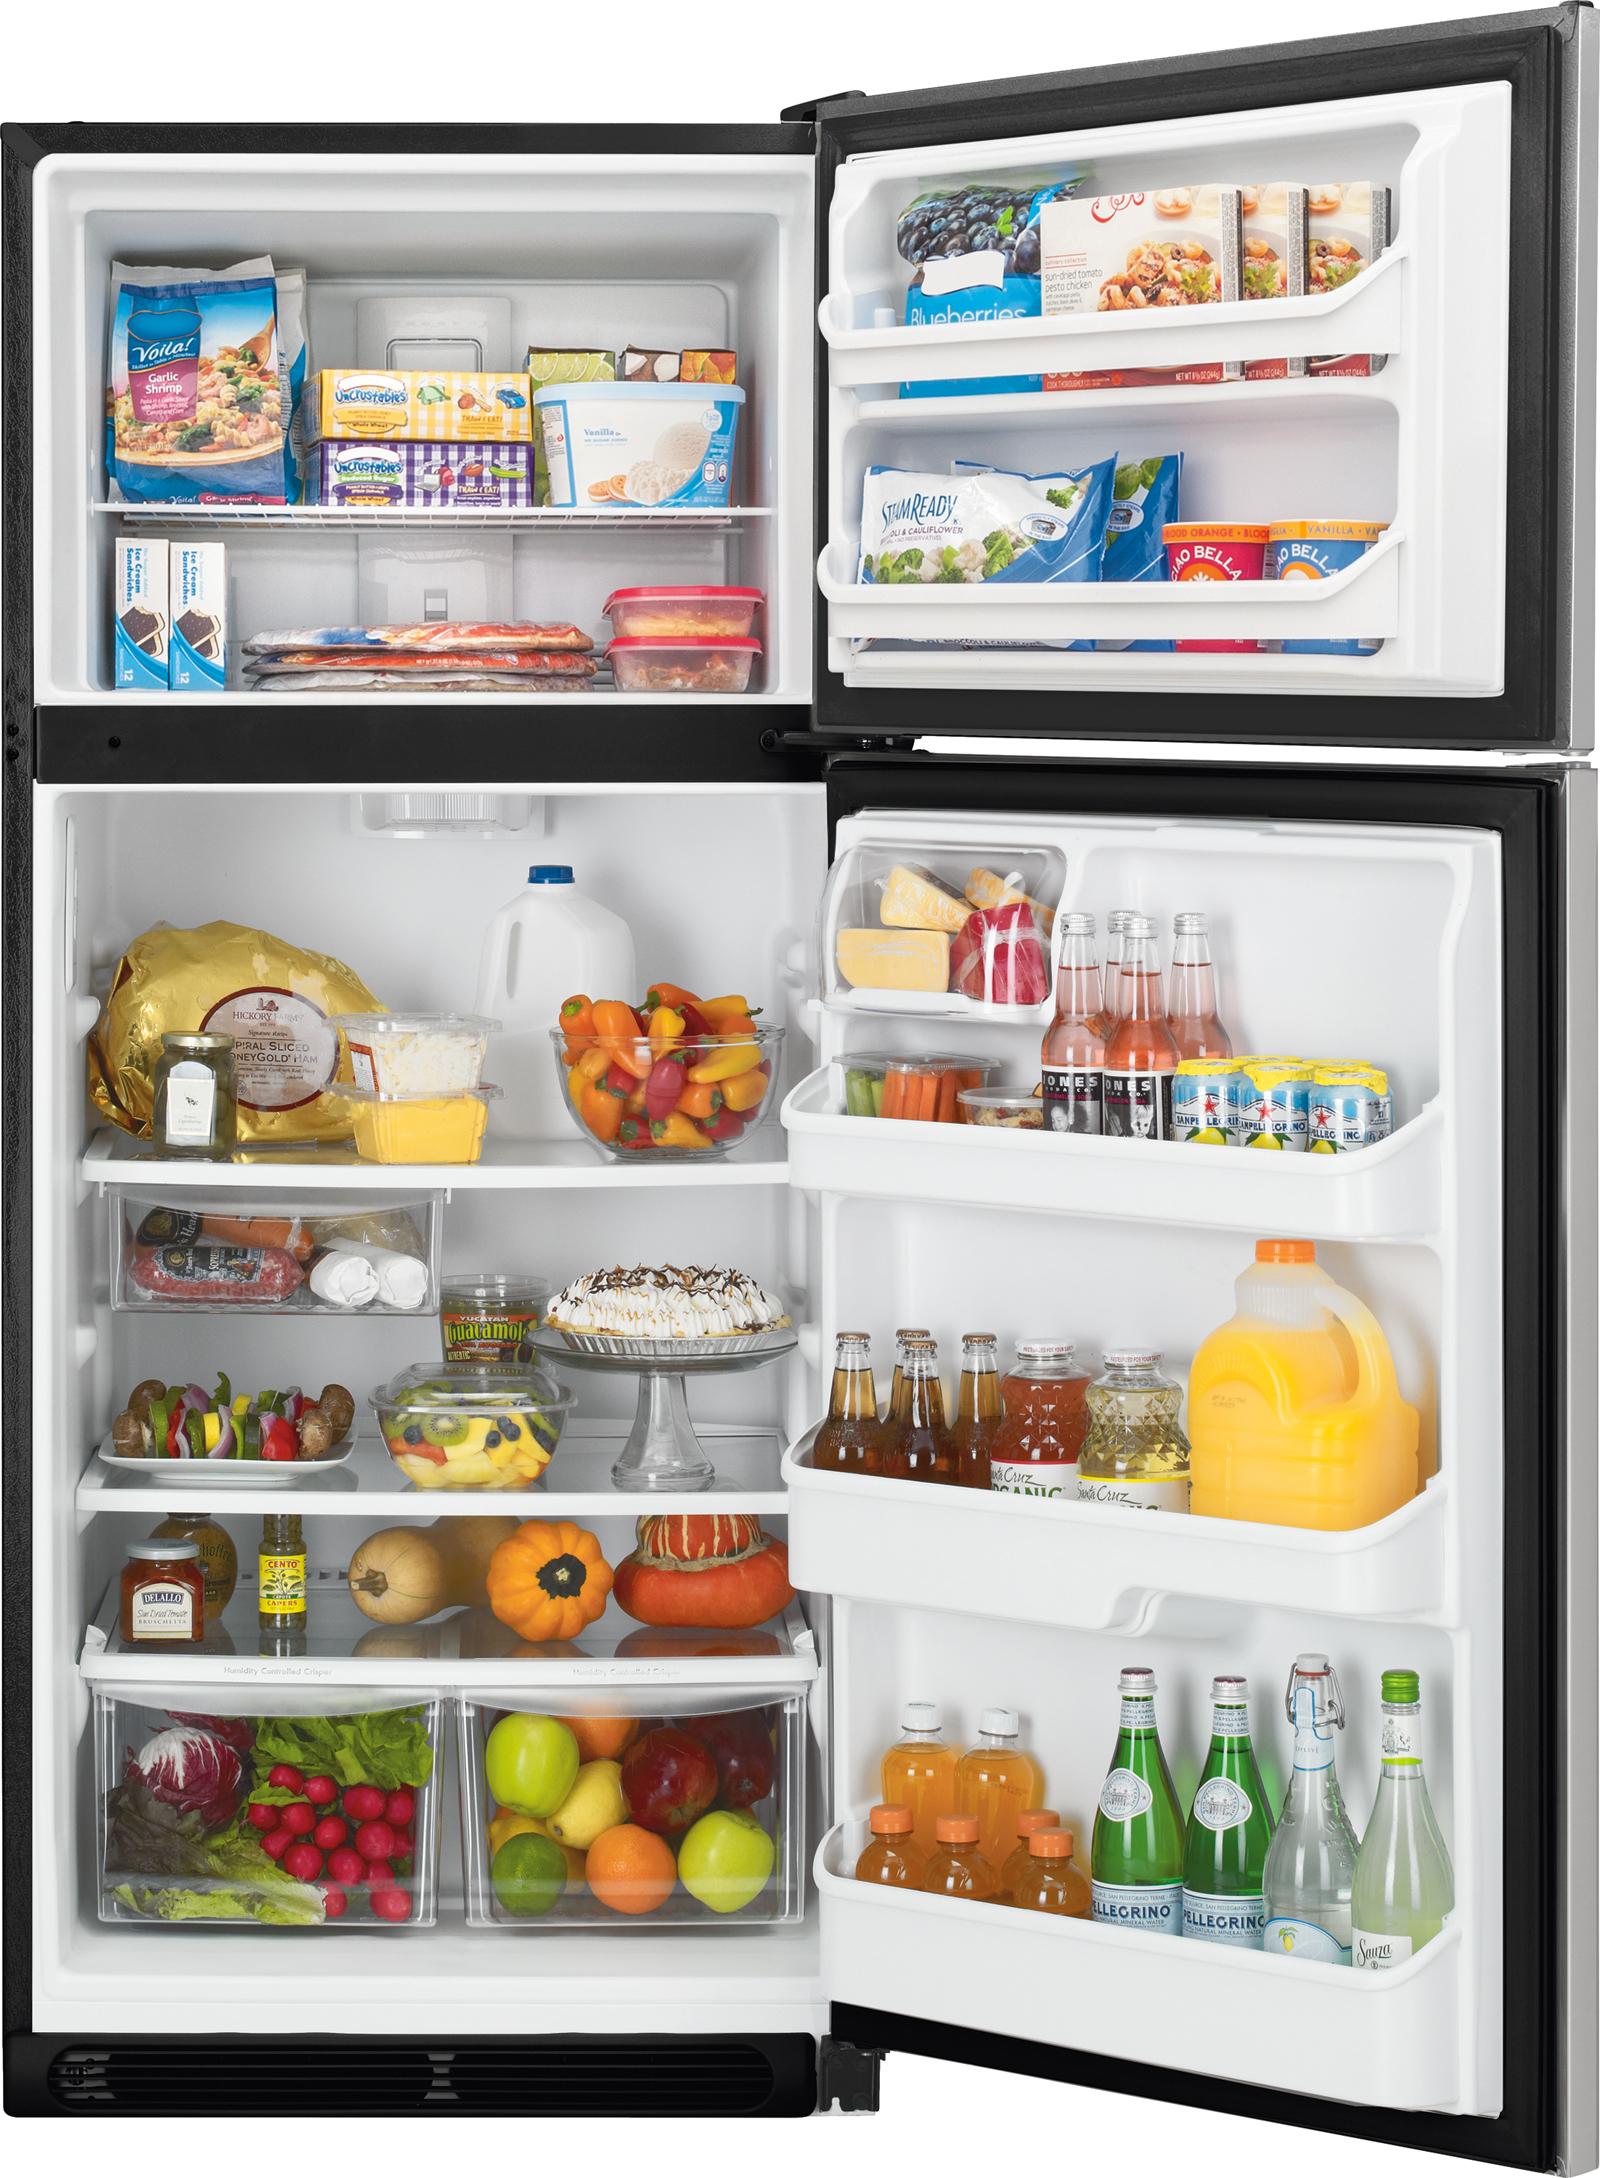 Kenmore 60113 20.4 cu. ft. Top Mount Refrigerator - Stainless Steel